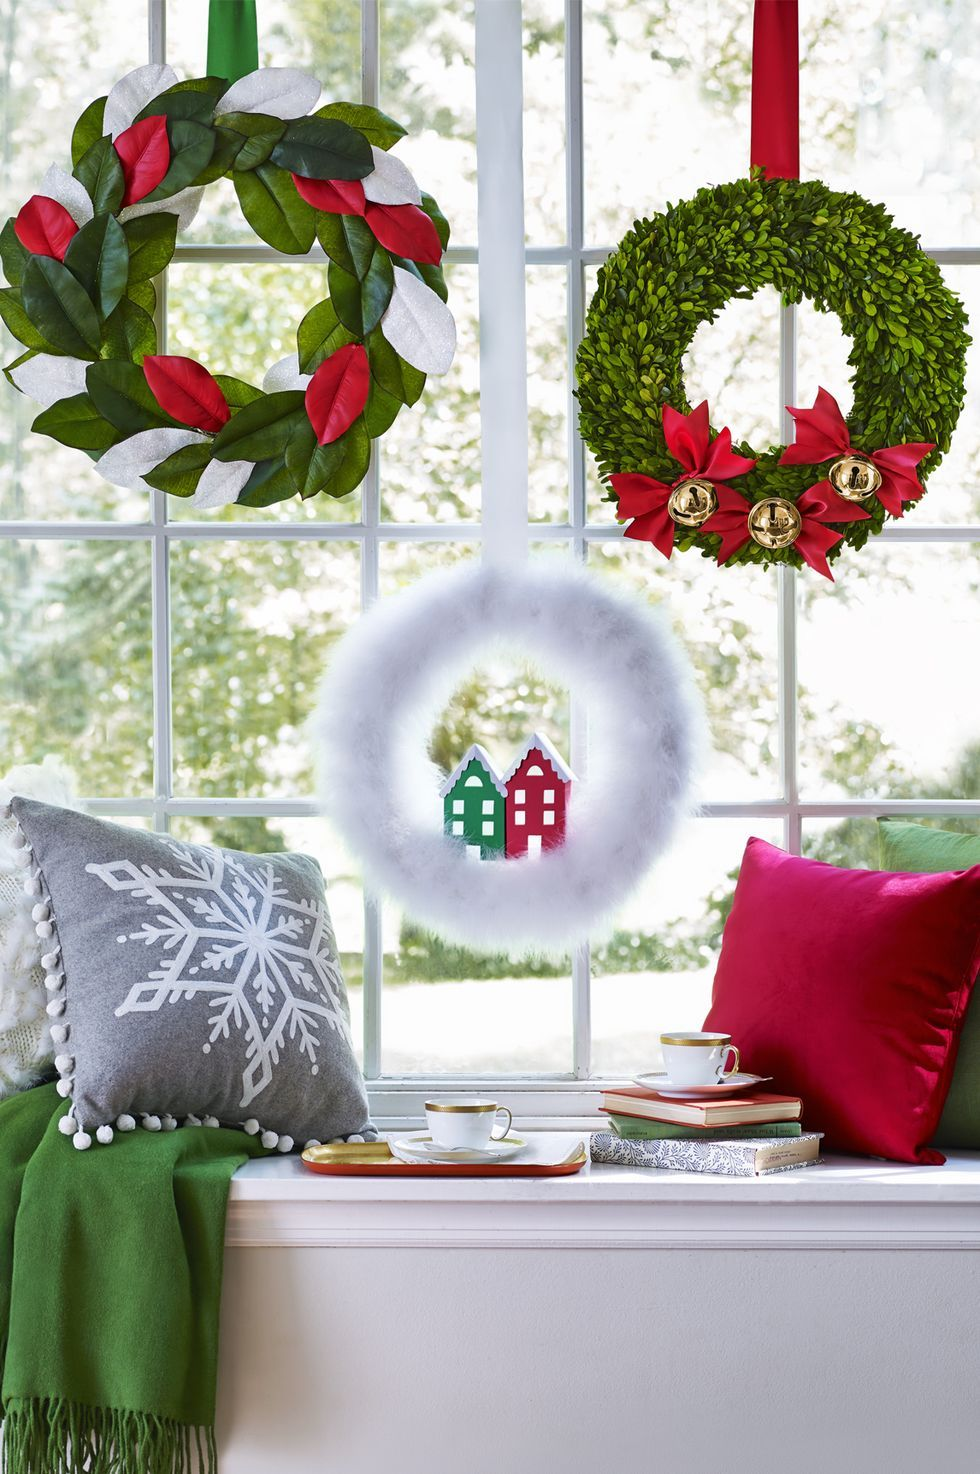 80 DIY Christmas Wreaths , How to Make Holiday Wreaths